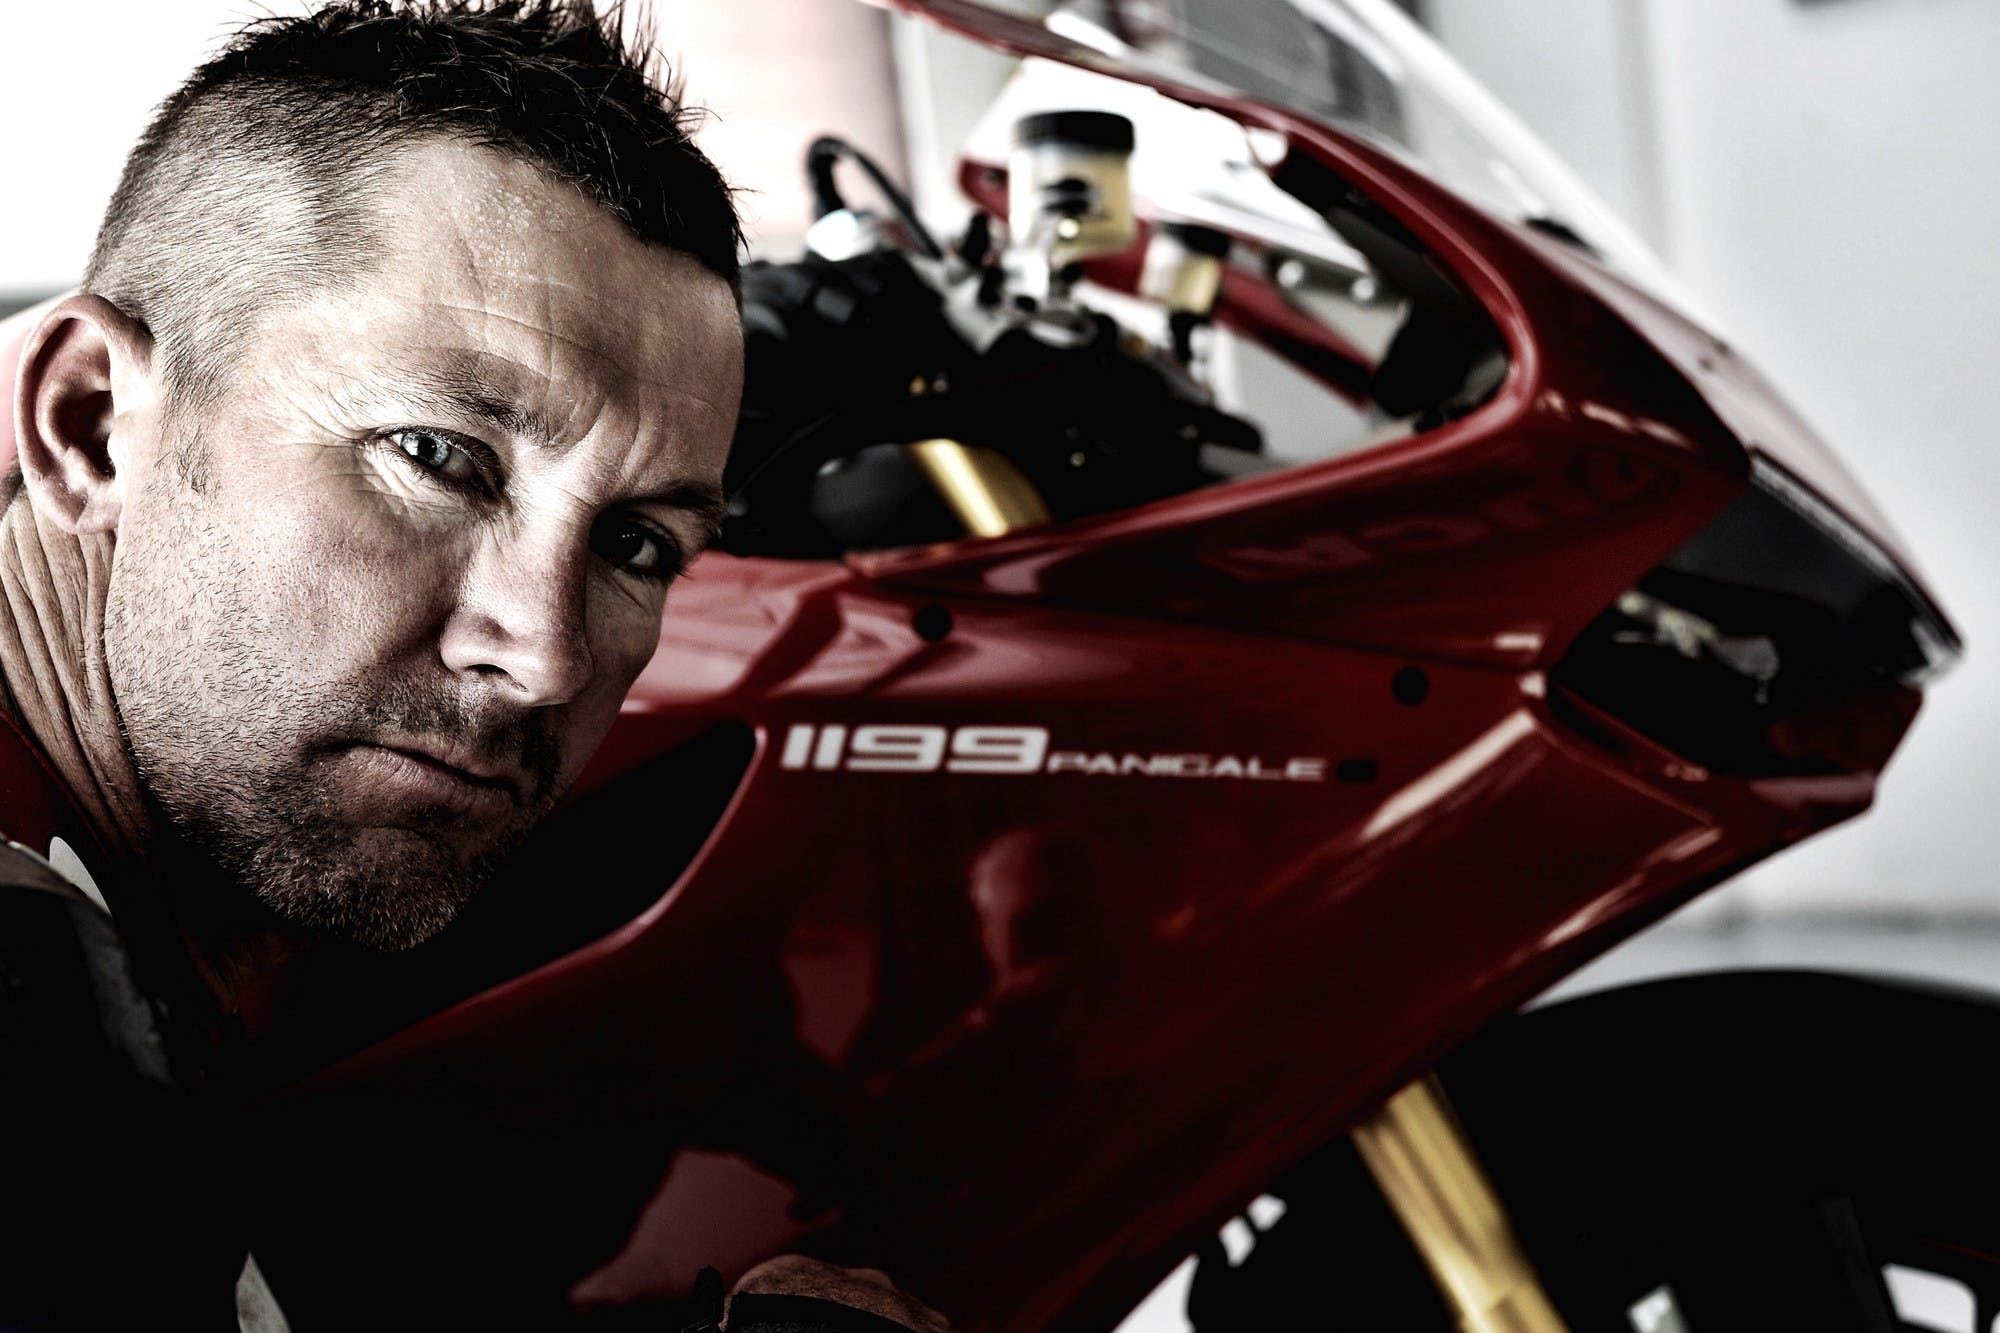 Troy bayliss e Ducati 1199 Panigale